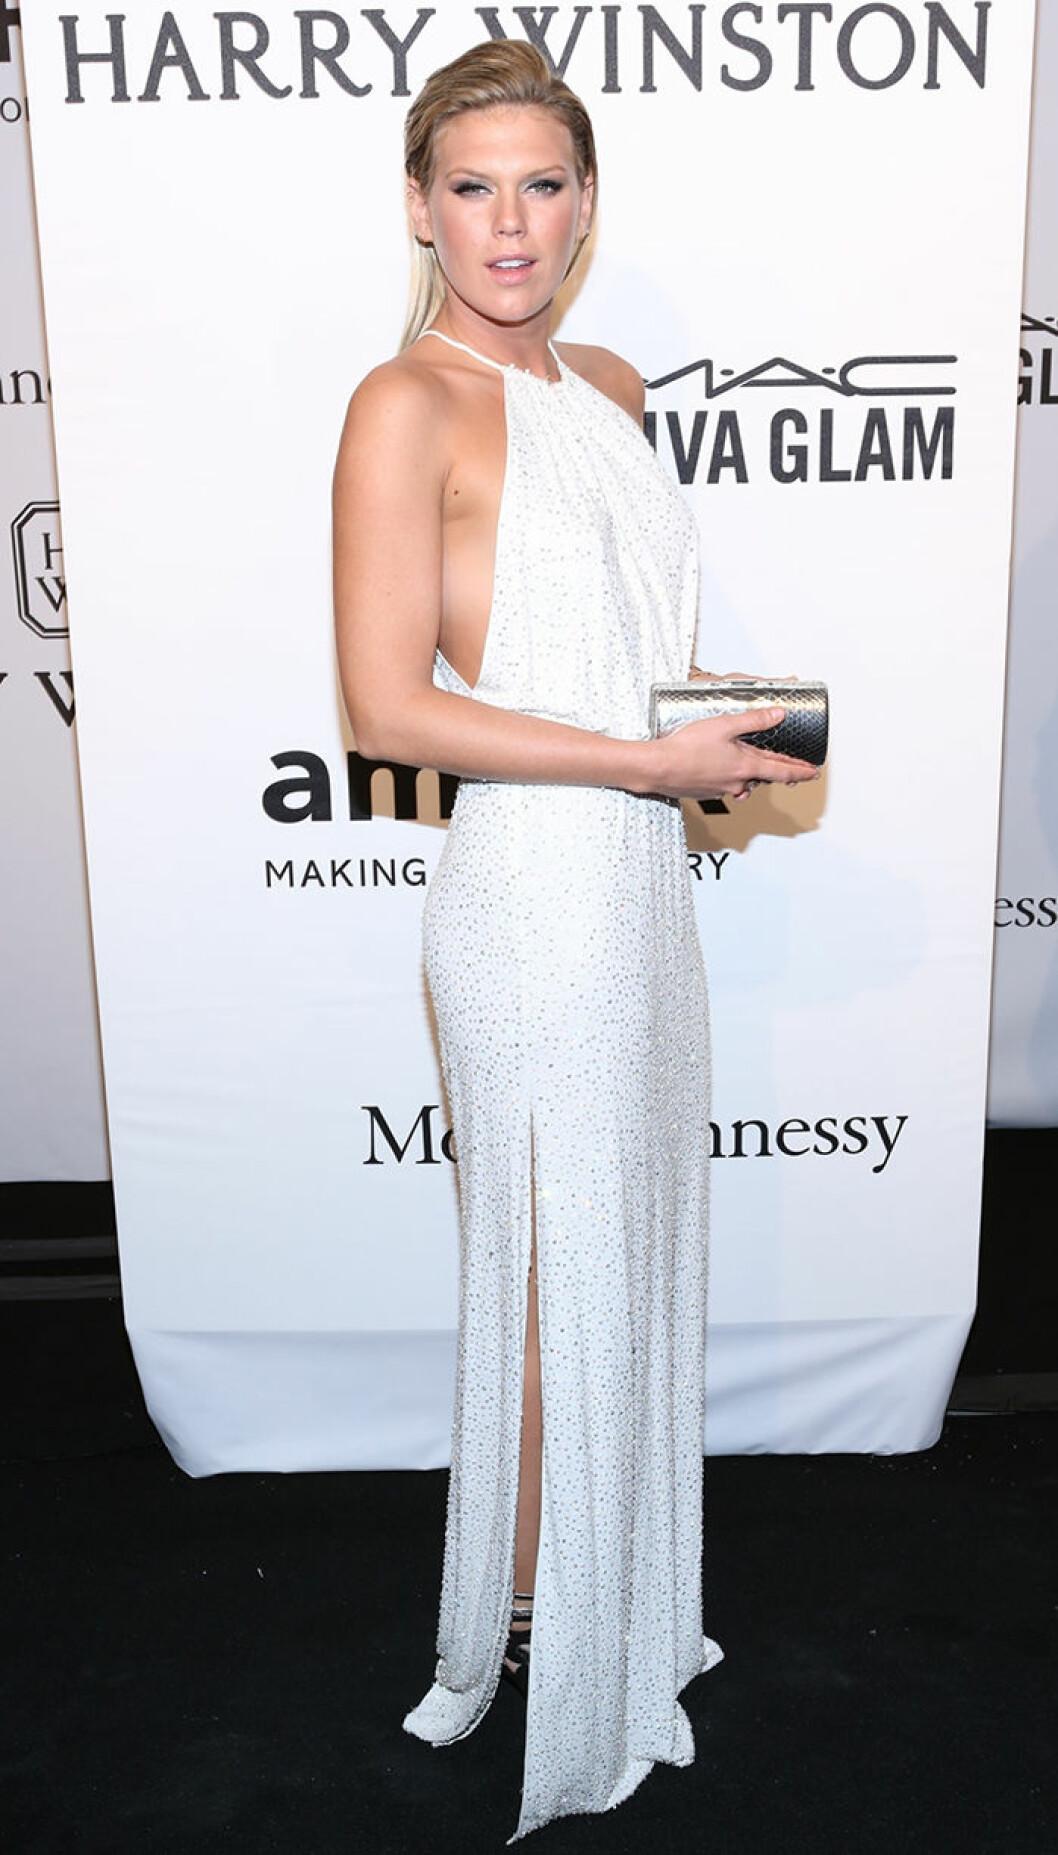 Alexandra Richards seen attending the 2015 amfAR New York Gala at Cipriani Wall Street